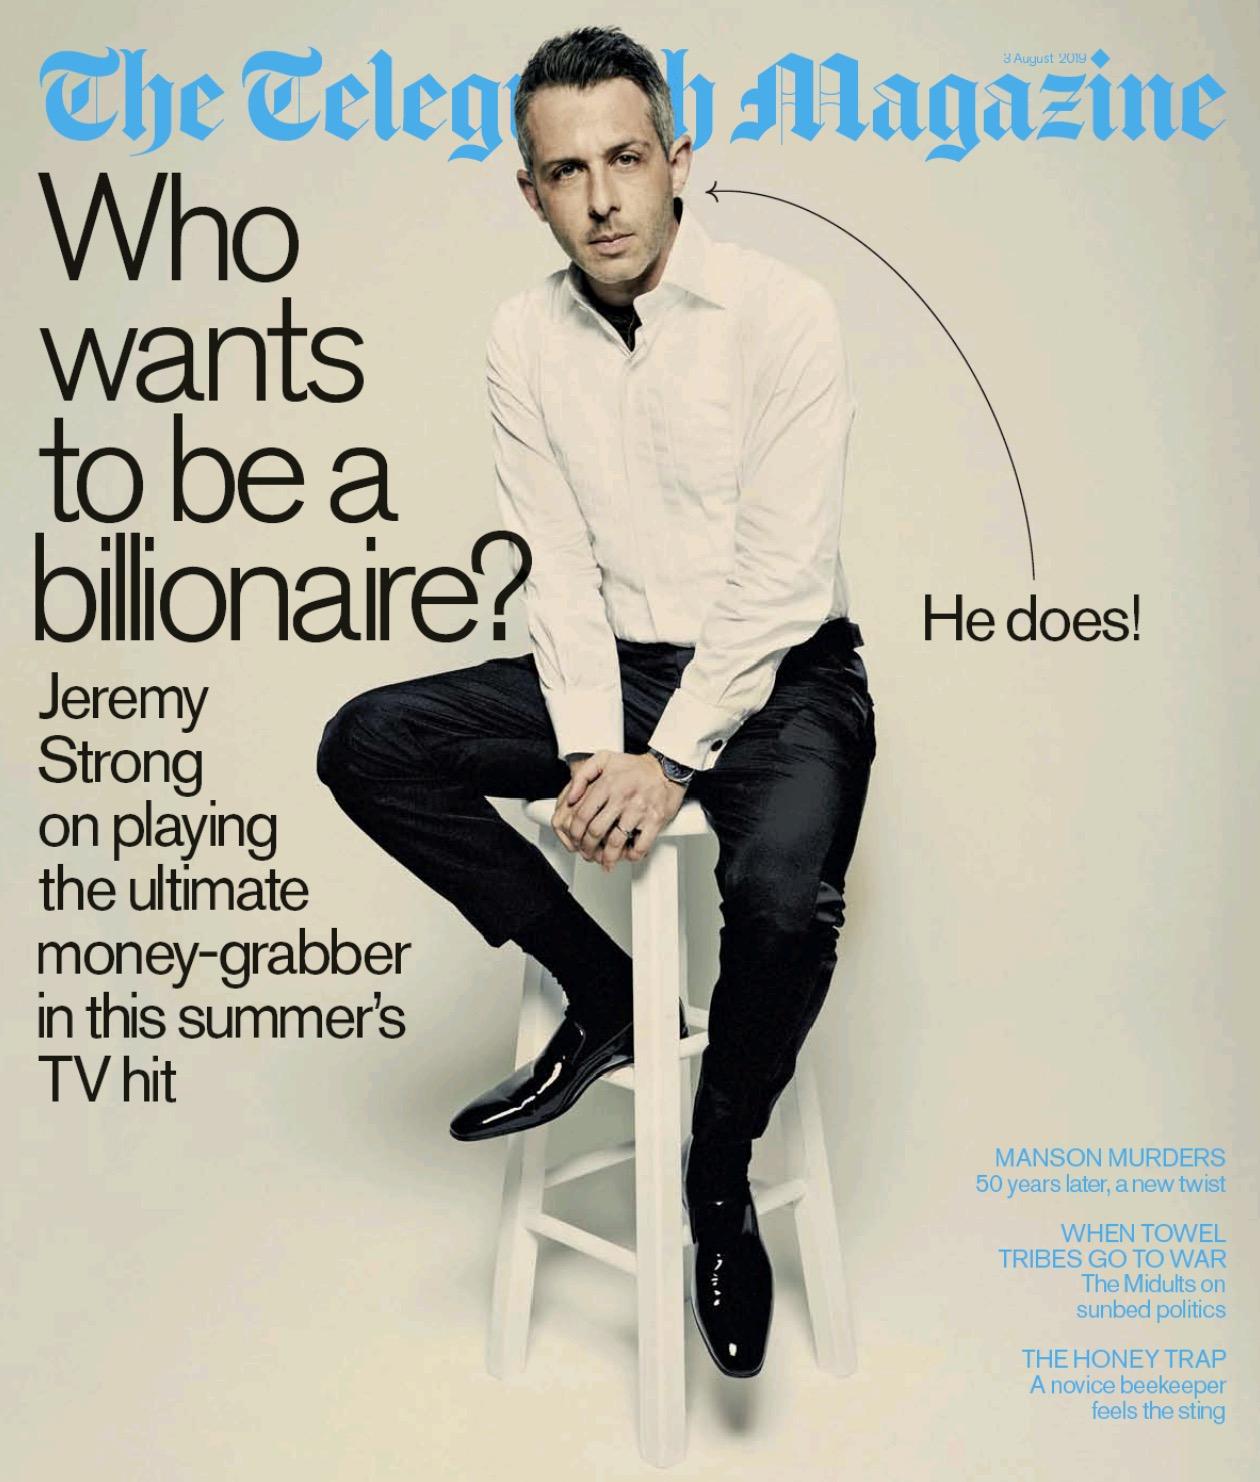 The Telegraph Magazine 03-08-2019 Cover.jpg